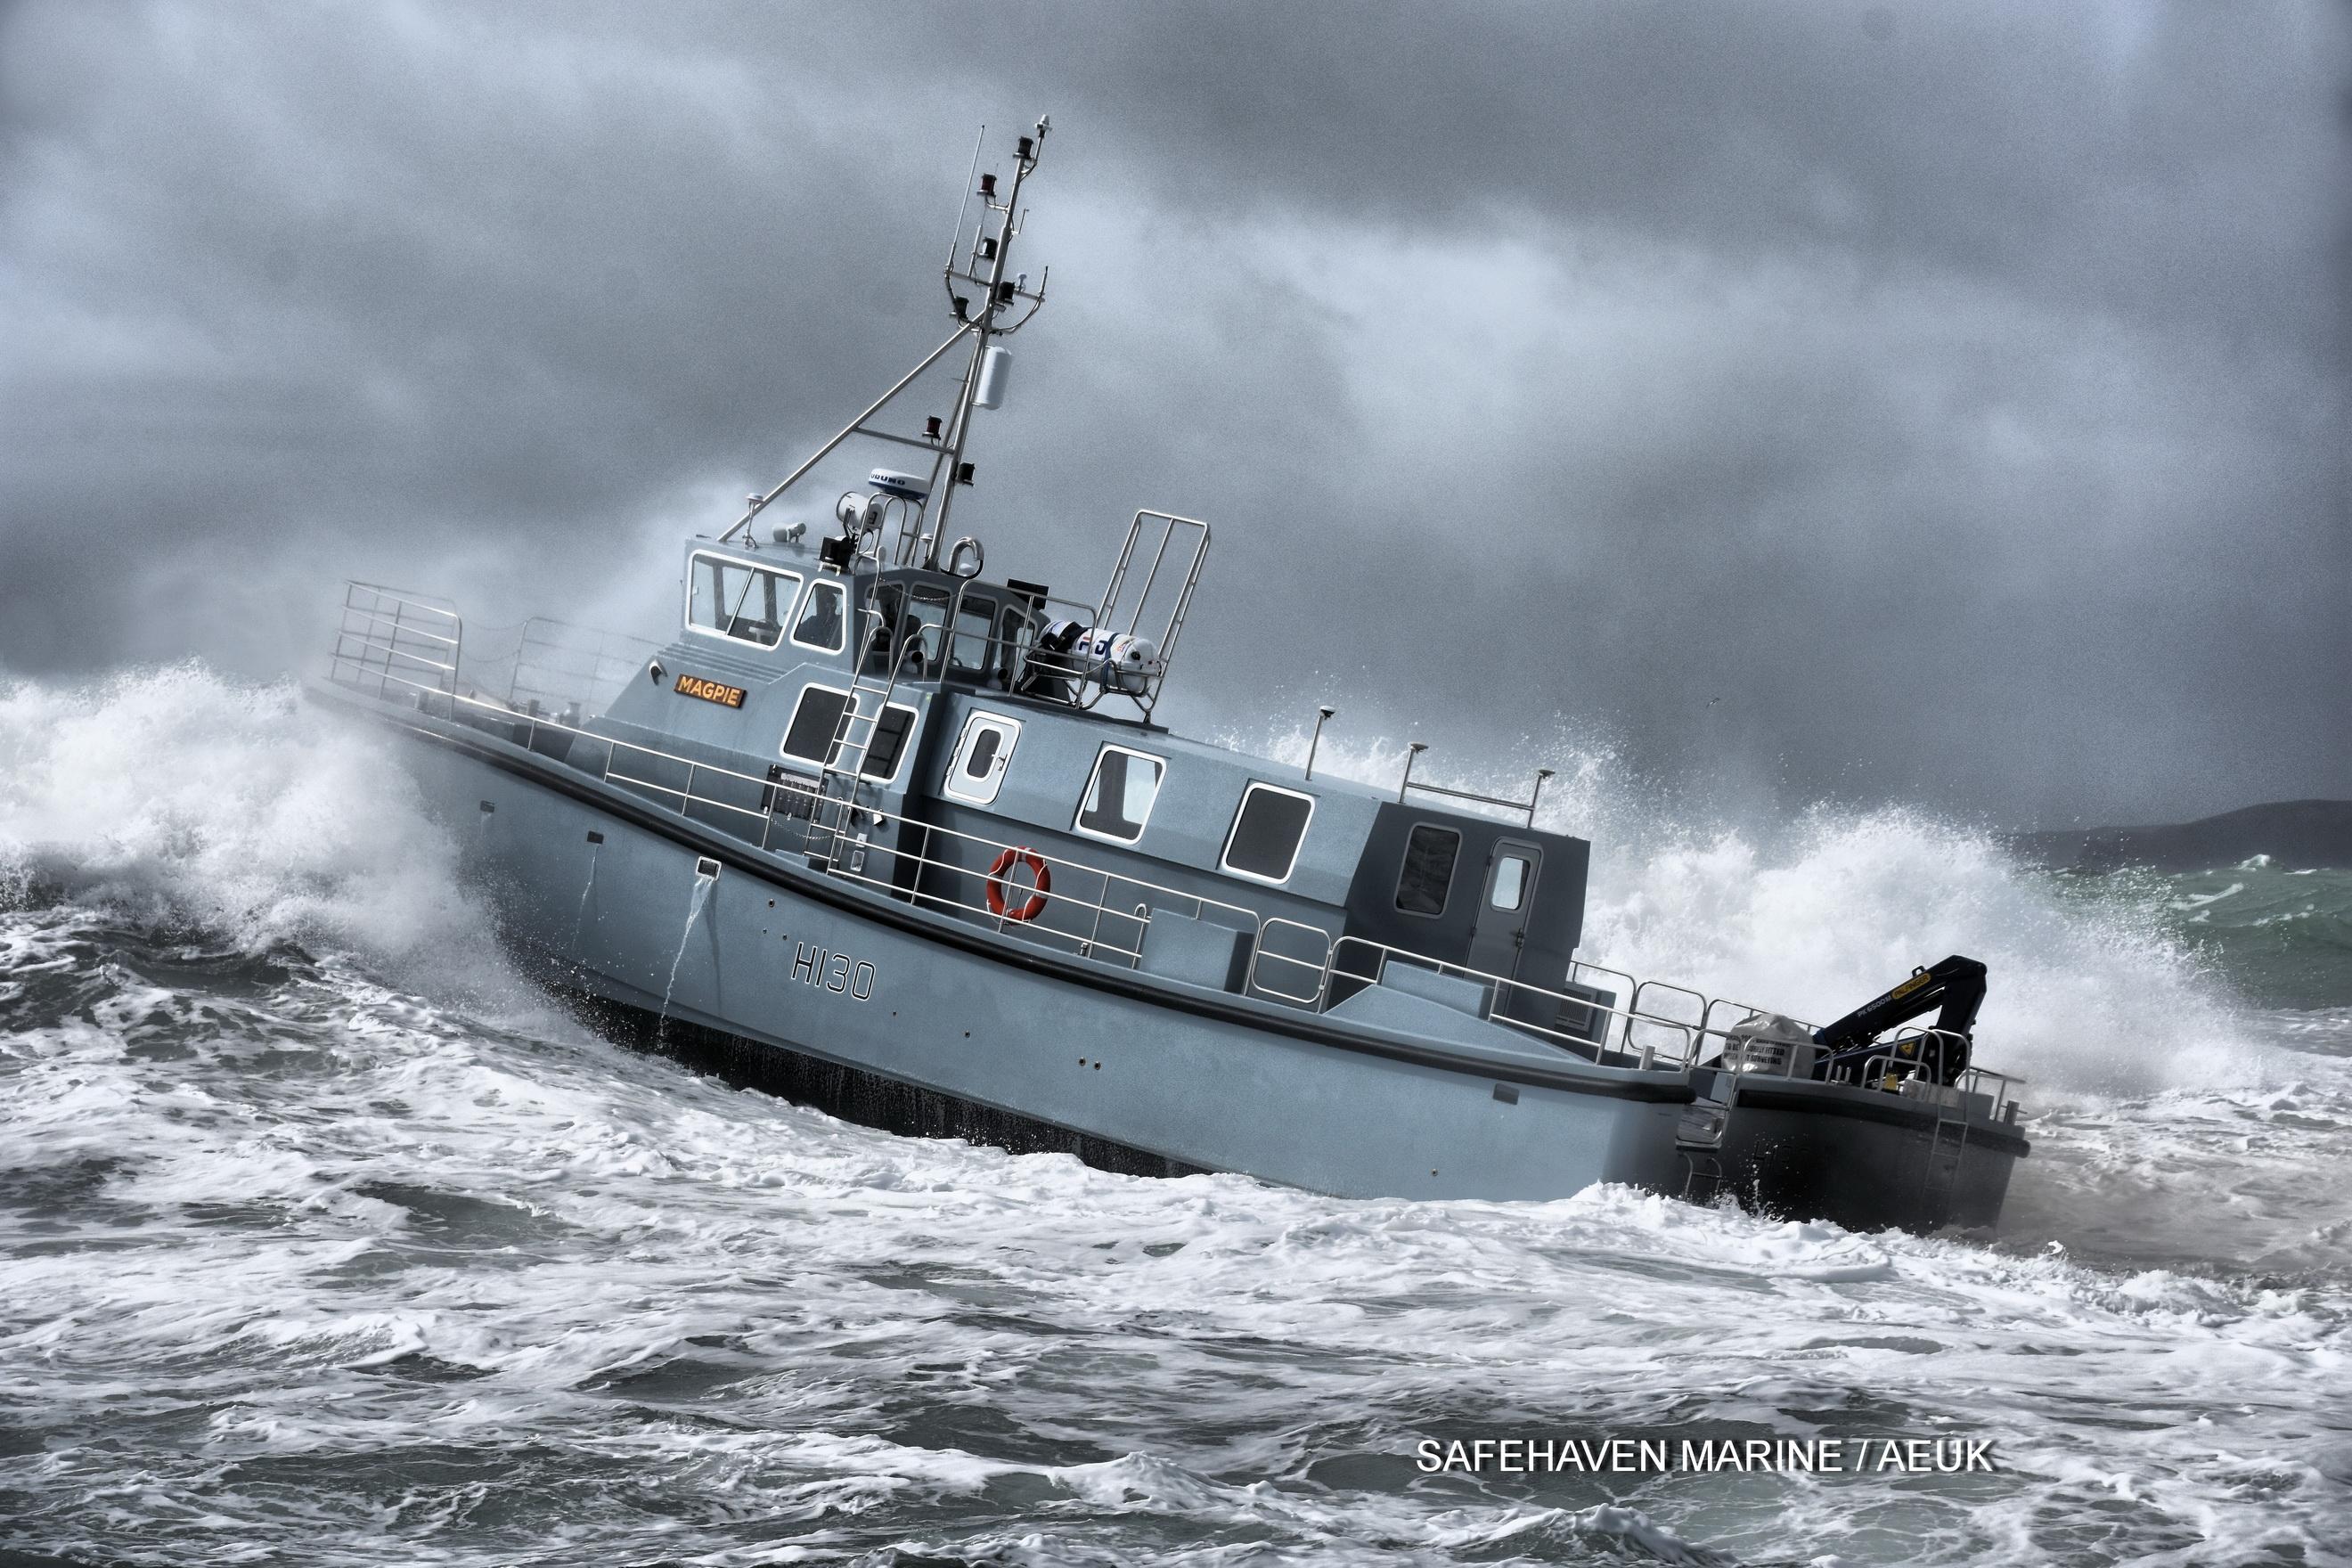 HMS Magpie 3 Safehaven Marine